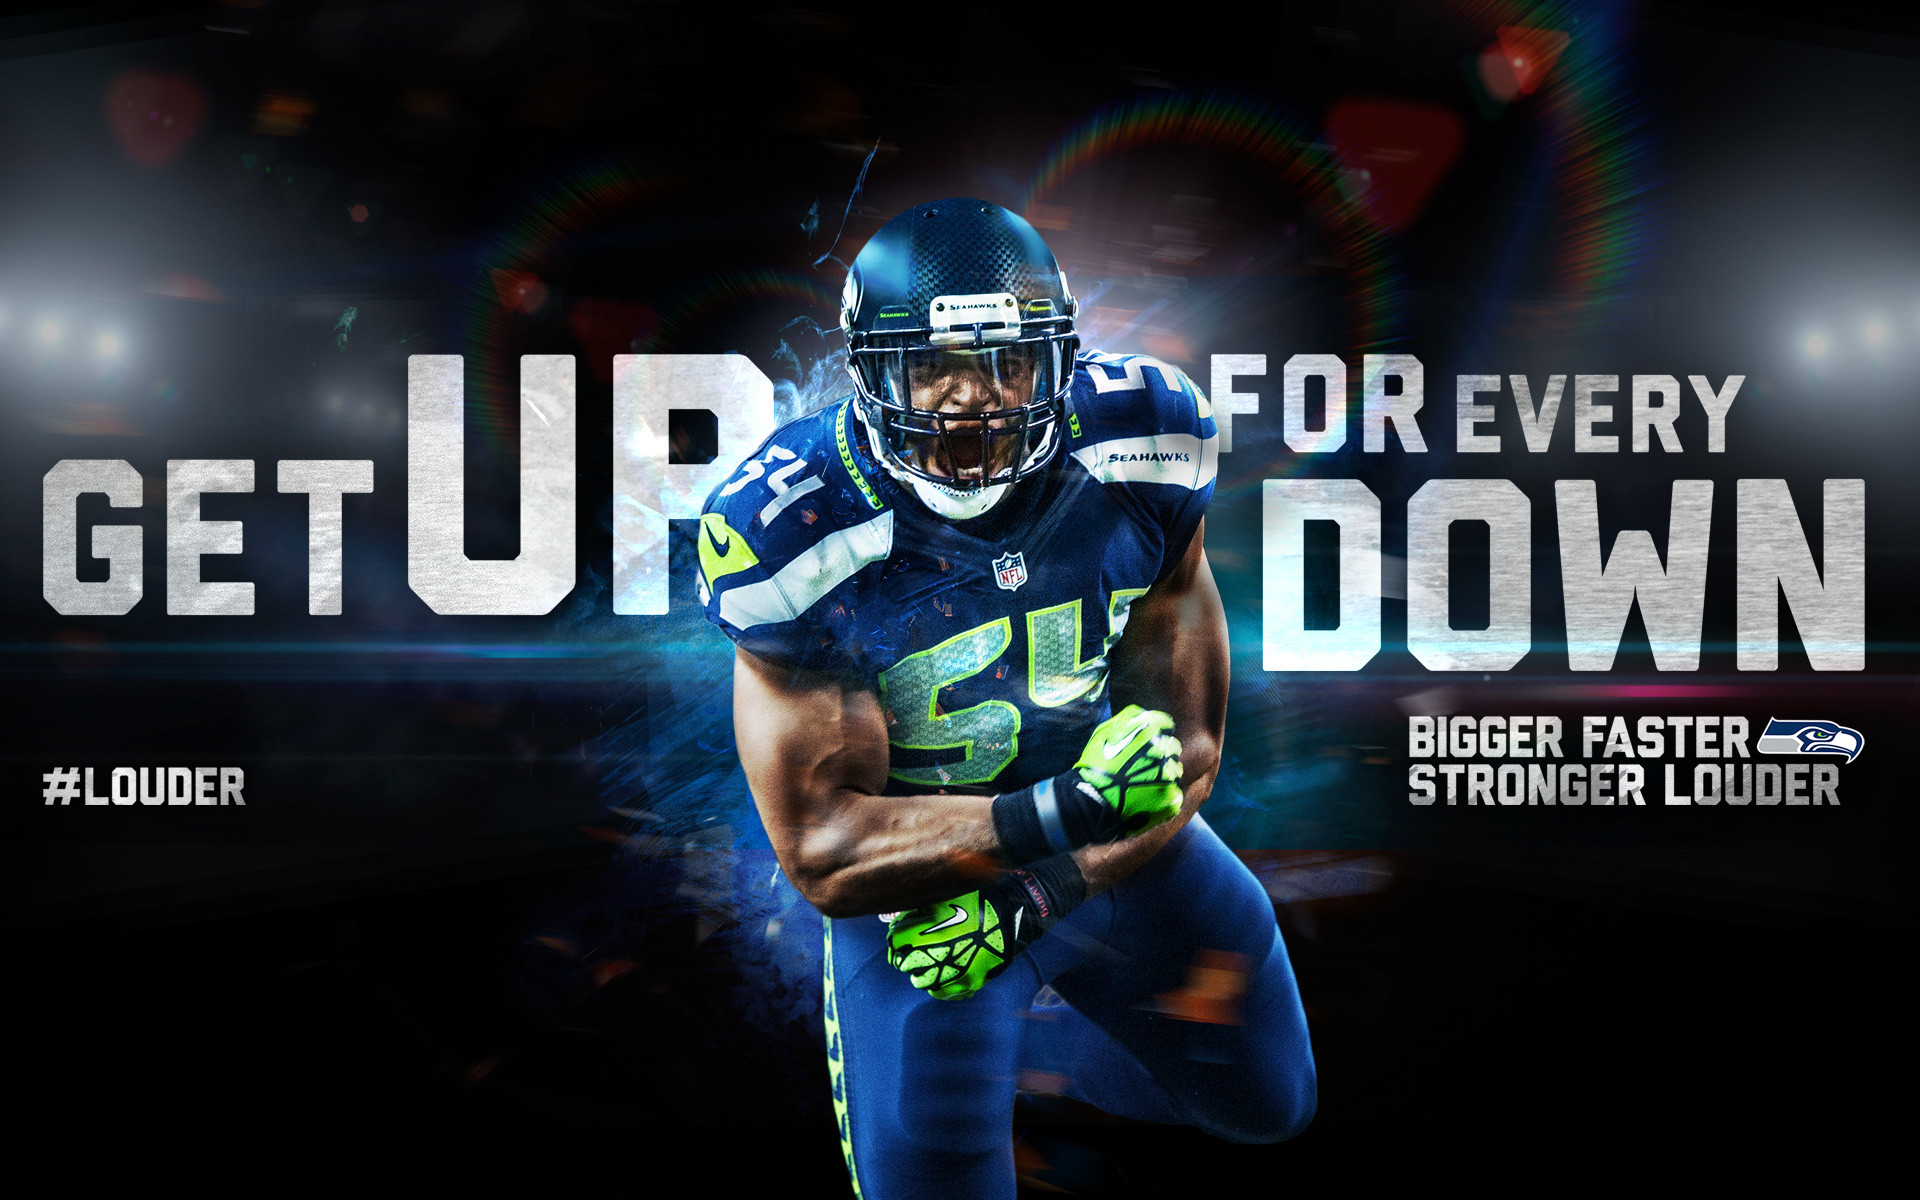 171 Seattle Seahawks Wallpapers | Seattle Seahawks Backgrounds Page 5